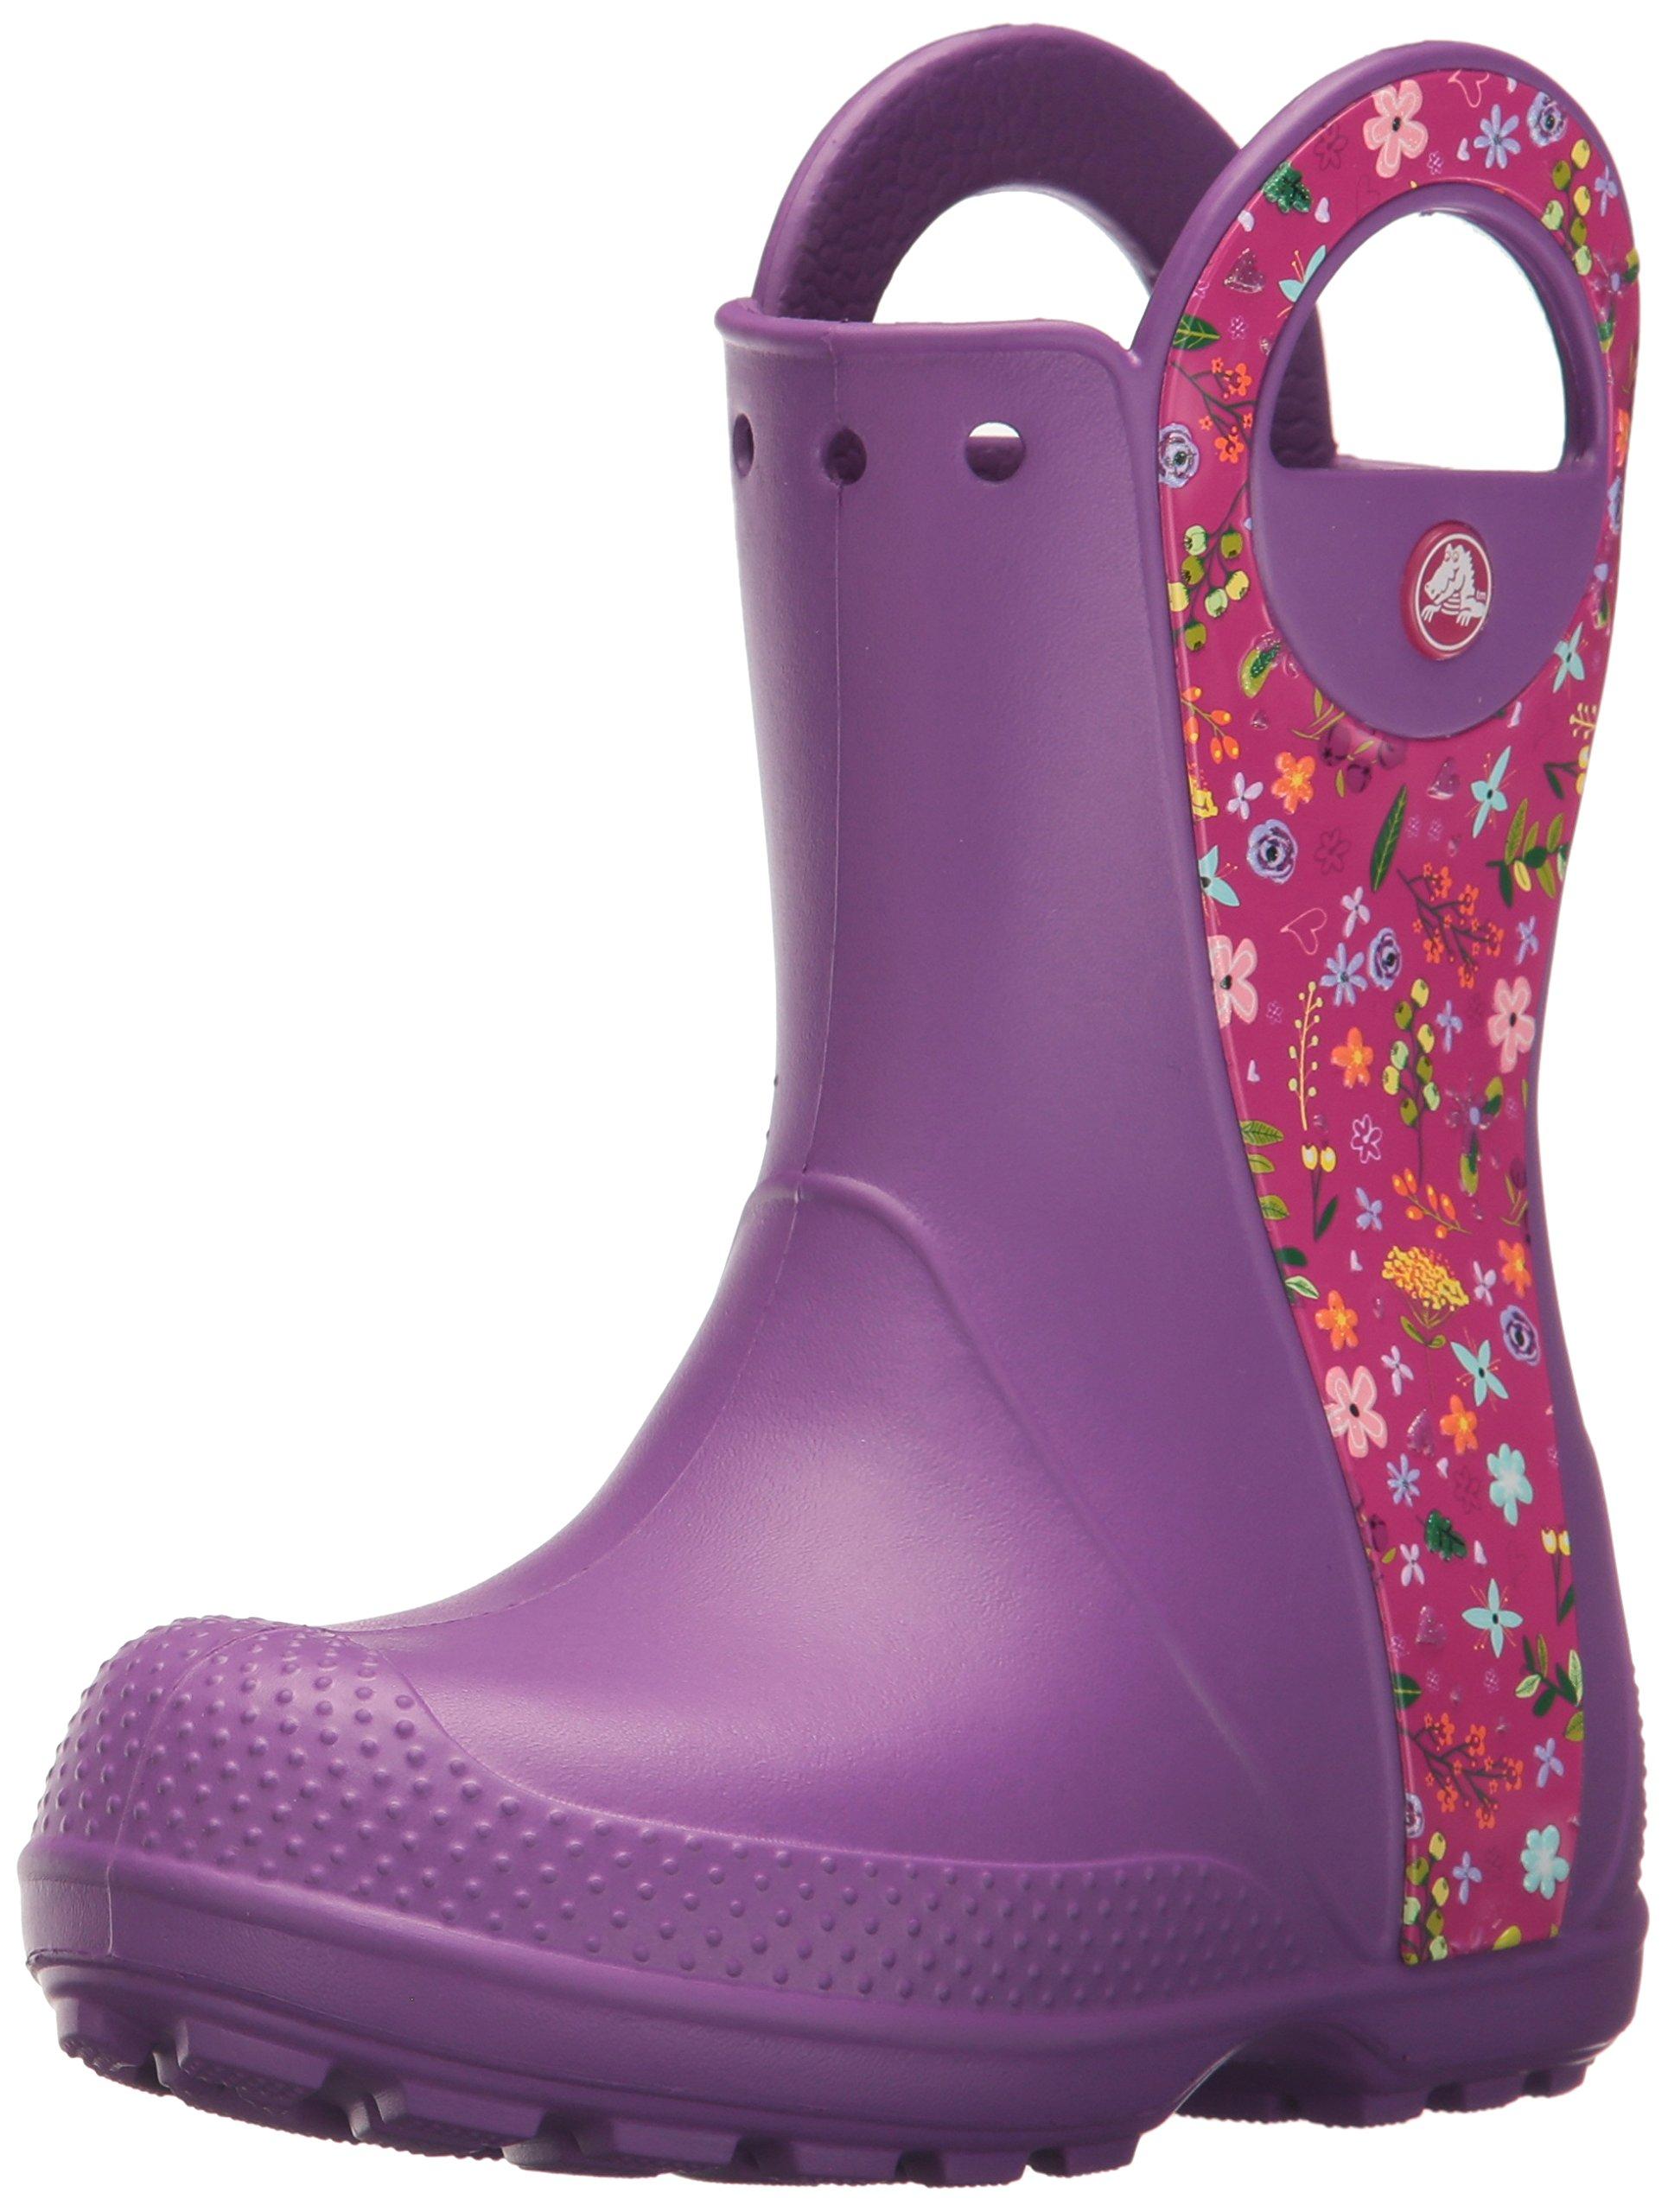 crocs Kids' Handle It Graphic Rain Pull-On Boot, Amethyst, 1 M US Little Kid